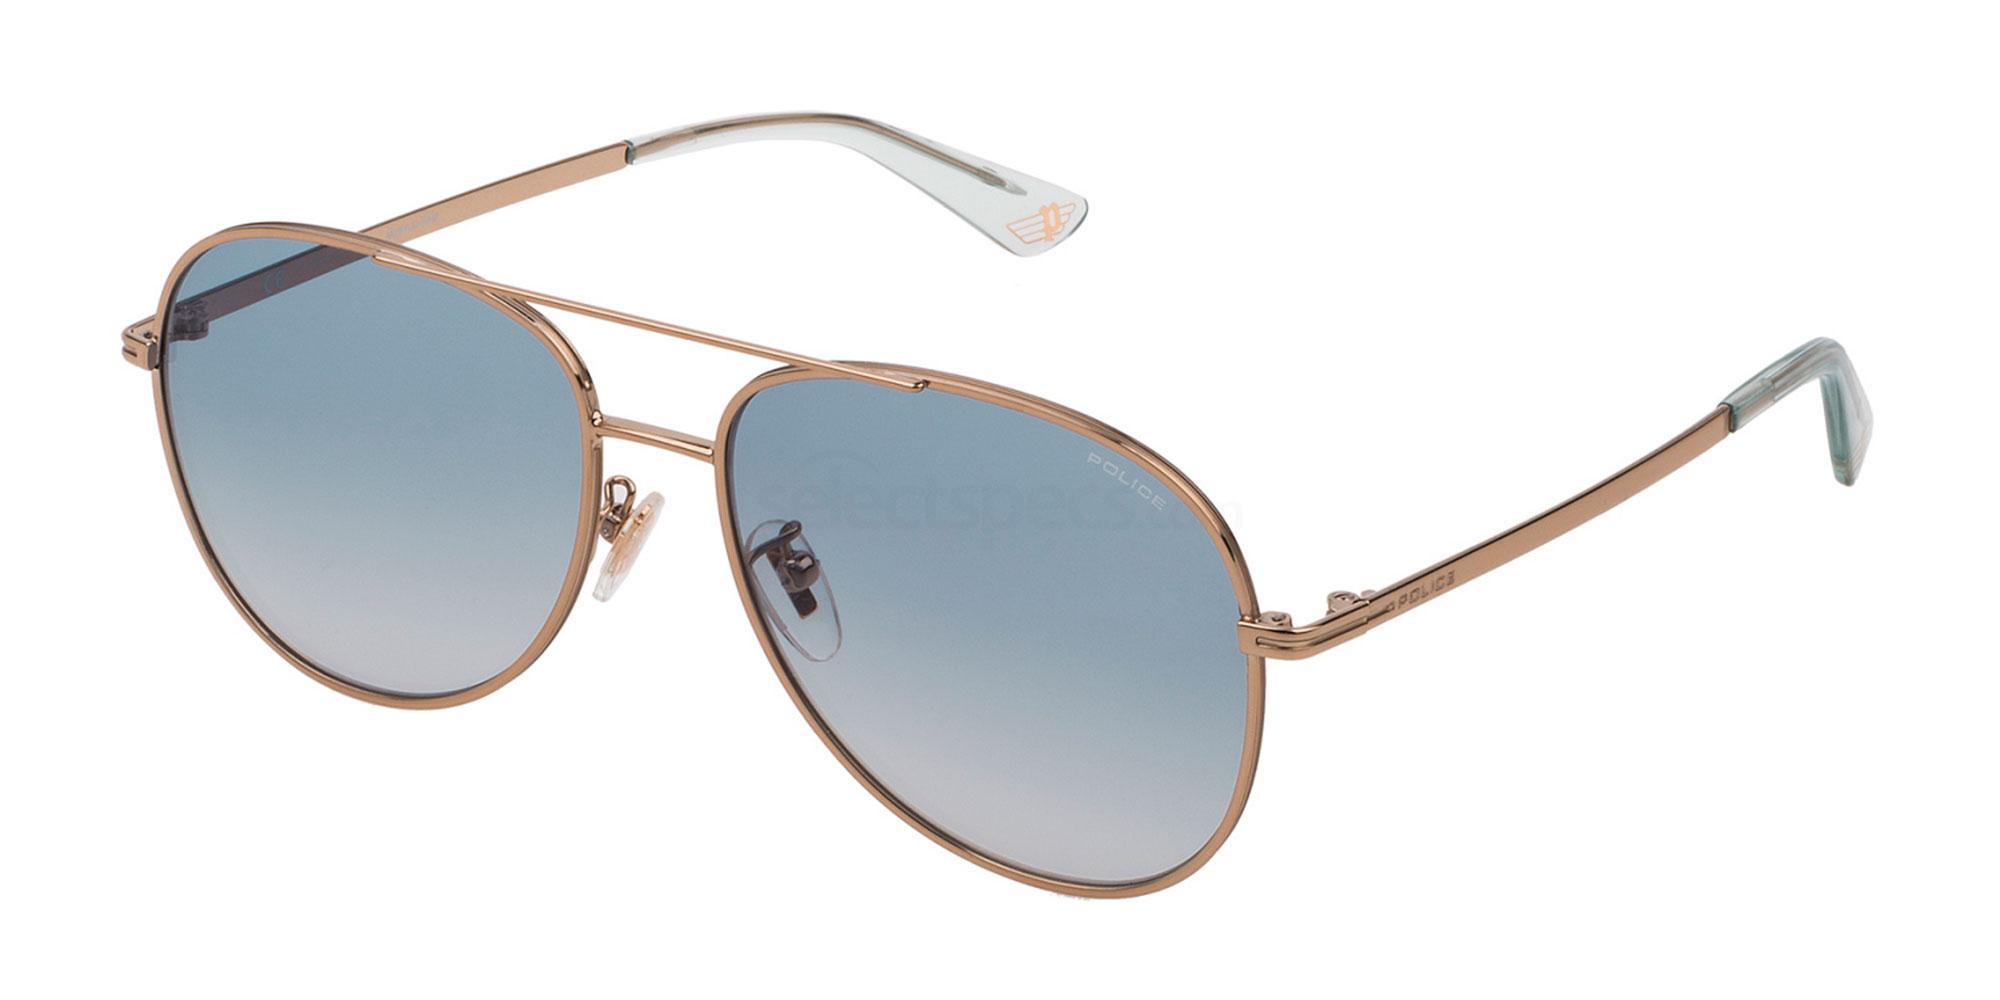 Tinted Sunglasses Men's Eyewear Trends 2019